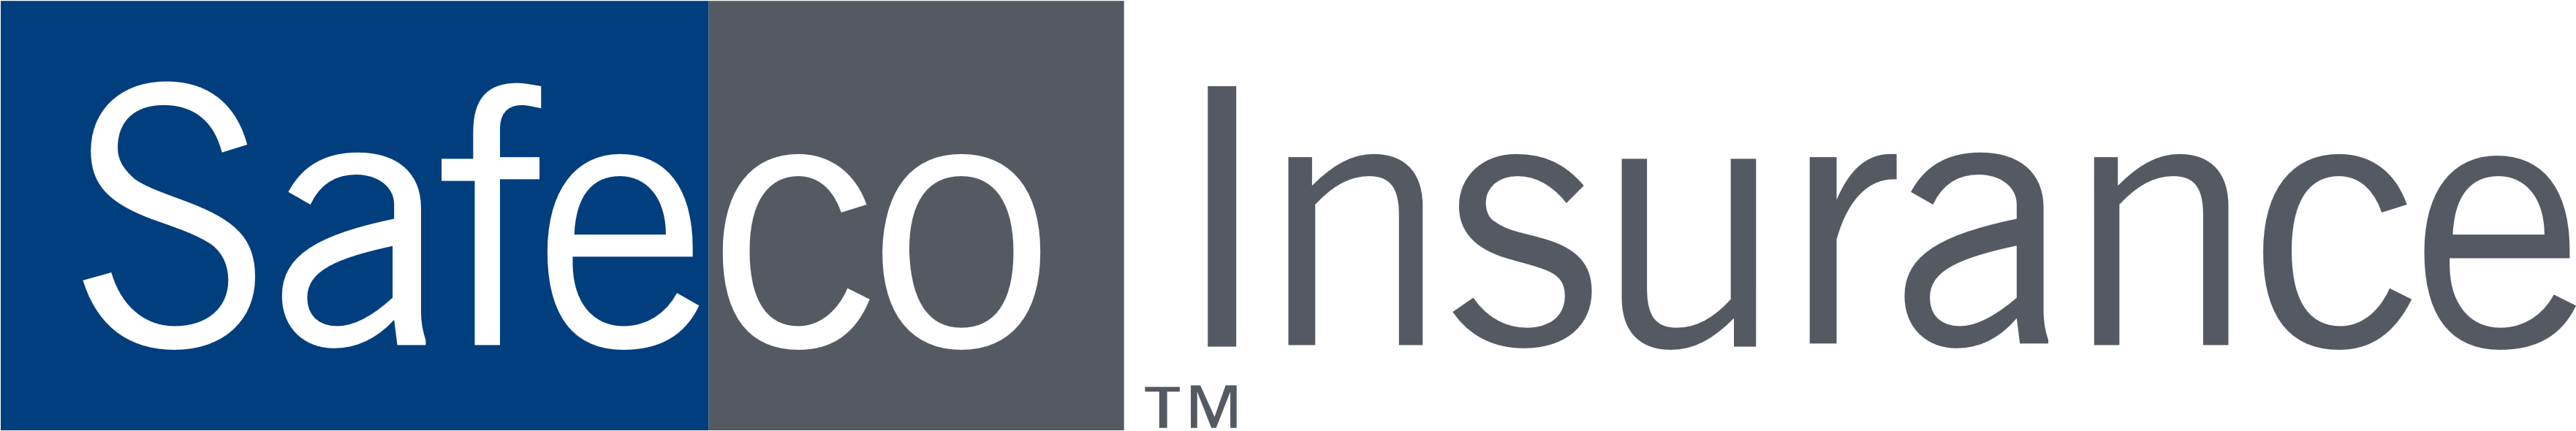 126-1260982_safeco-insurance-logo